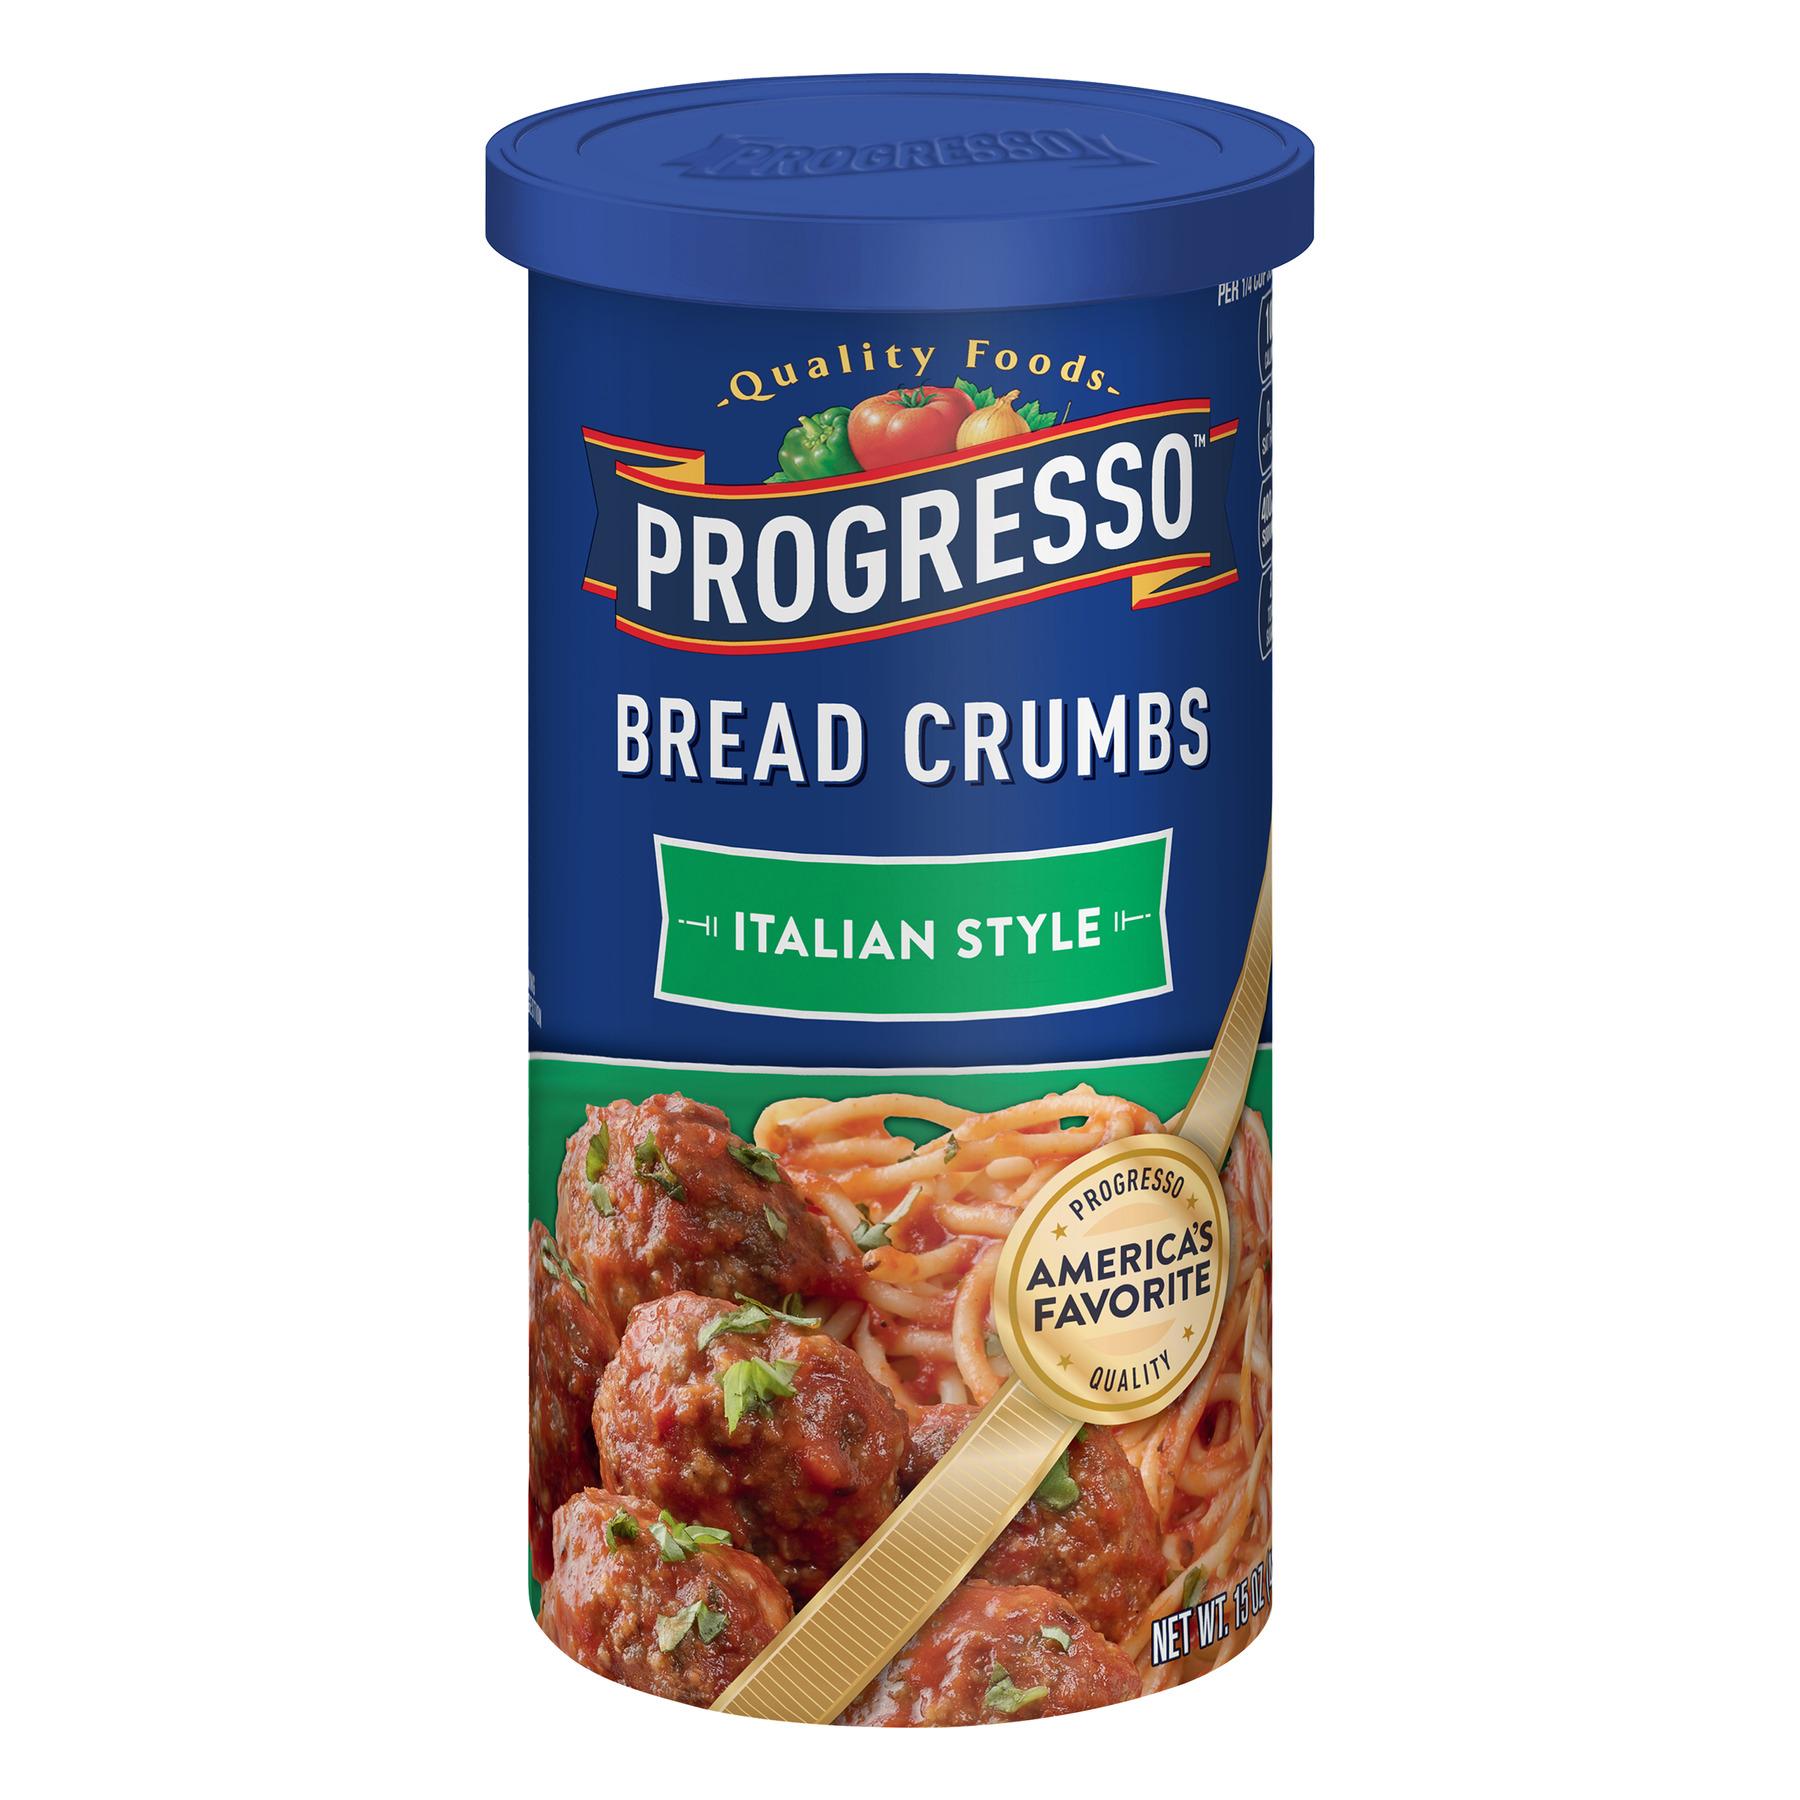 (5 Pack) Progresso Italian Style Bread Crumbs, 15 oz